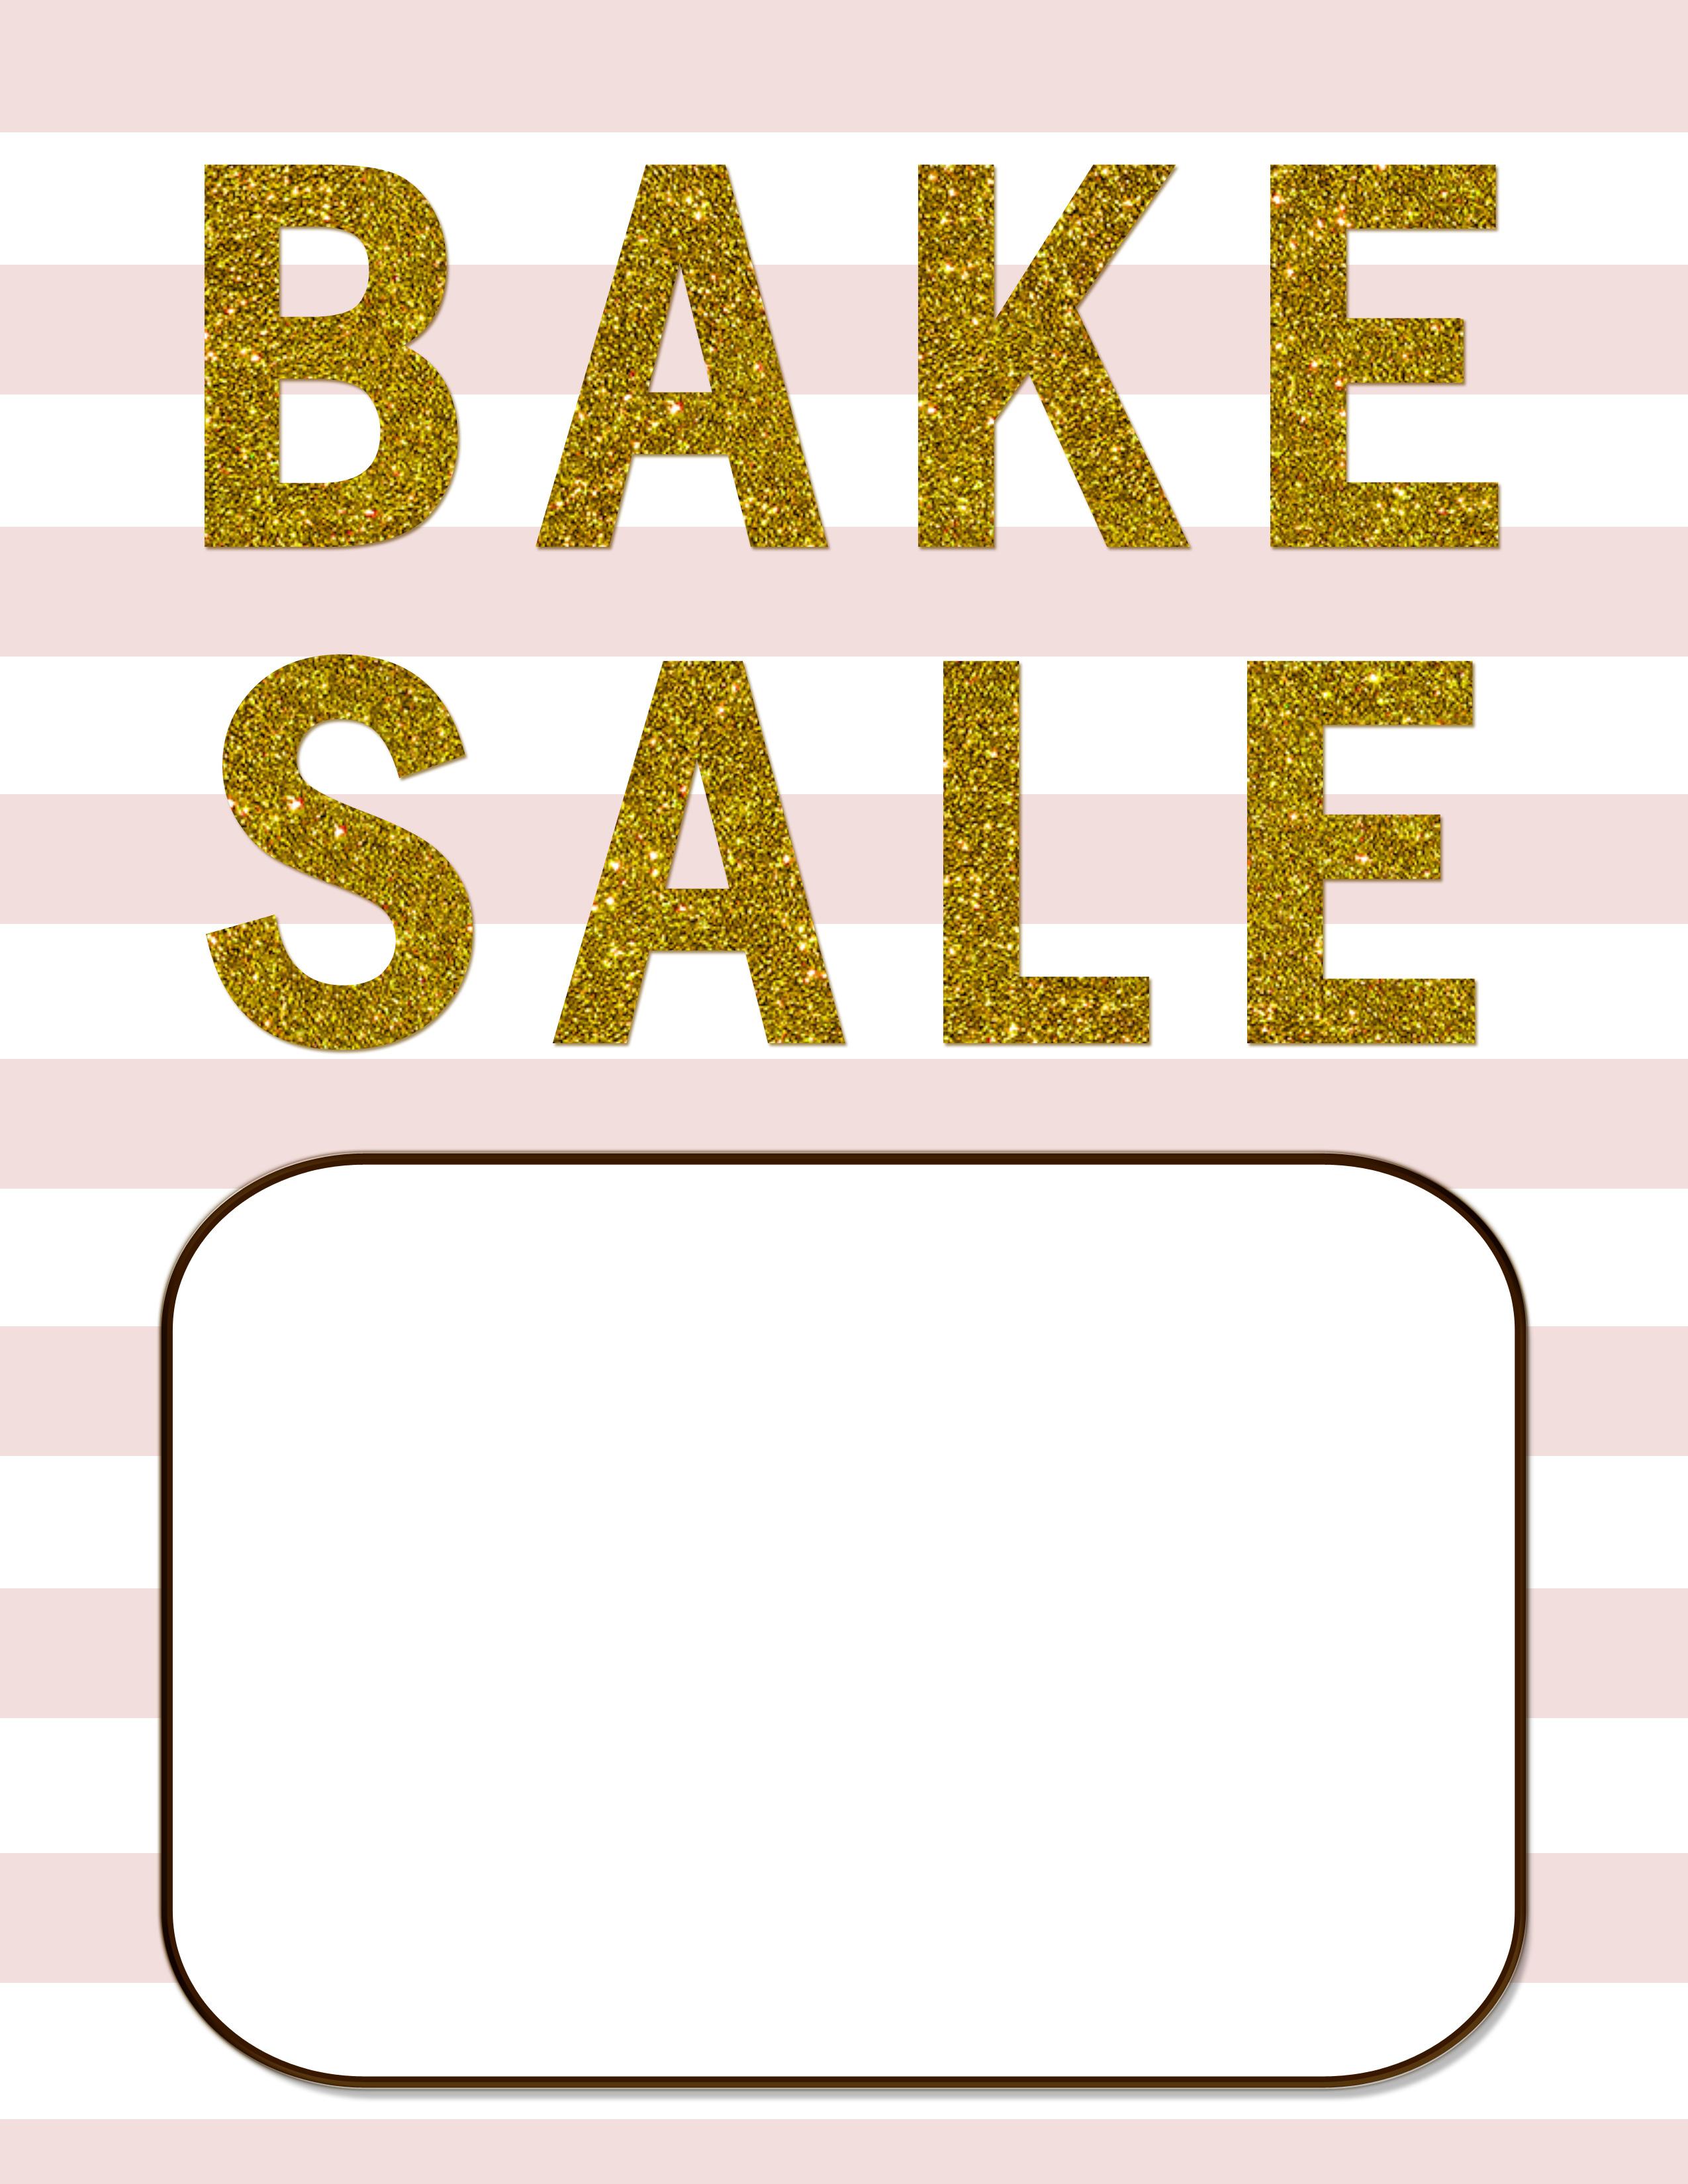 Bake Sale Flyers – Free Flyer Designs - Free Printable Fundraiser Flyer Templates